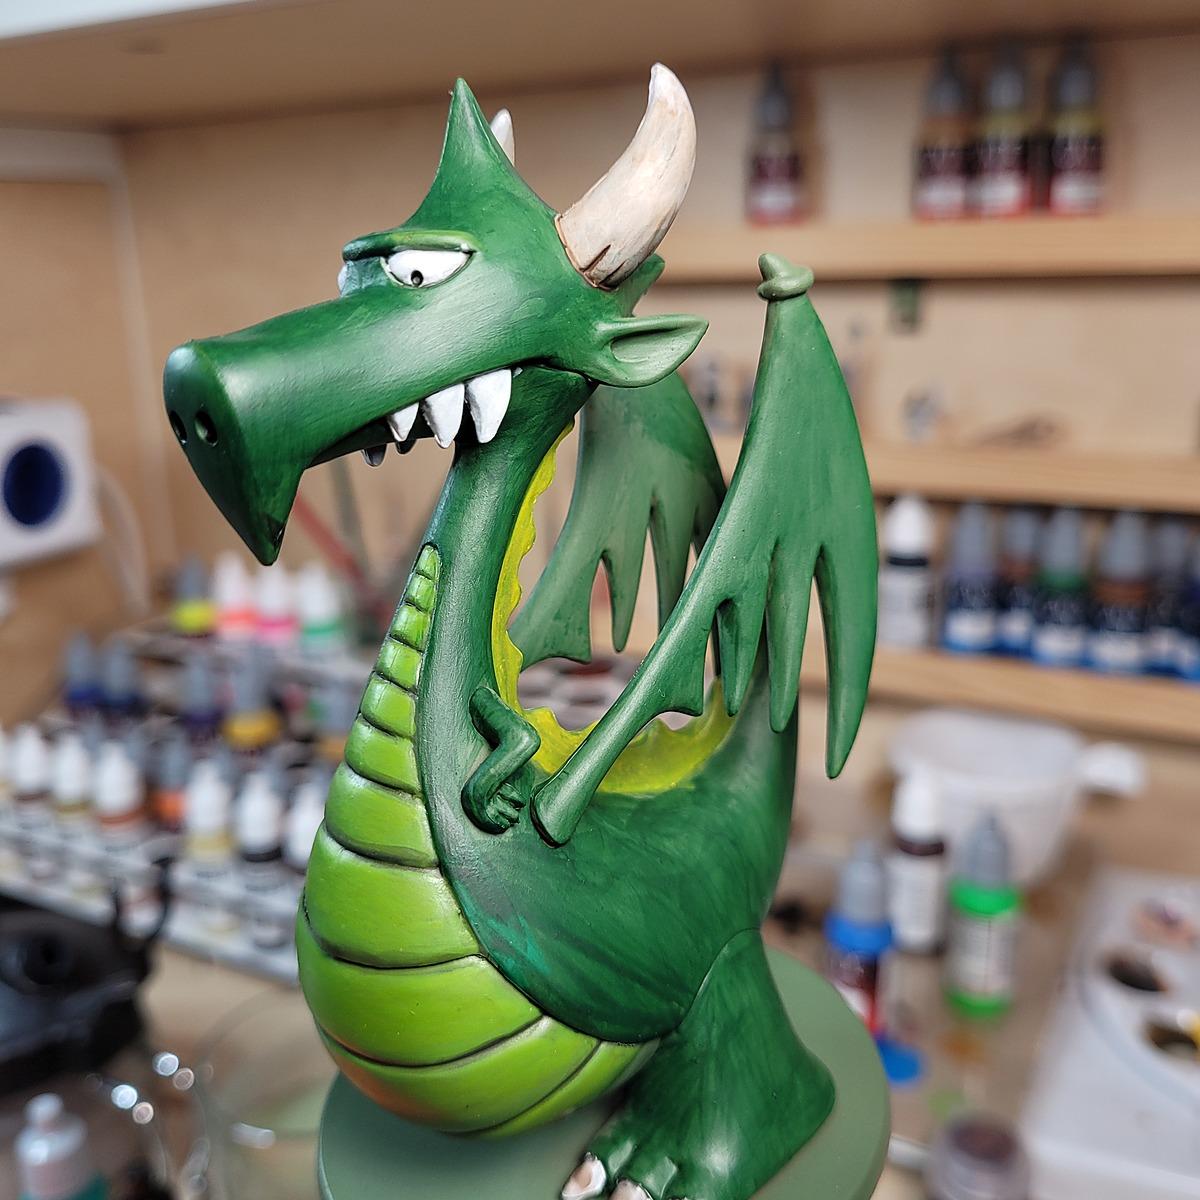 Dragon (Munchkin's Dungeon)